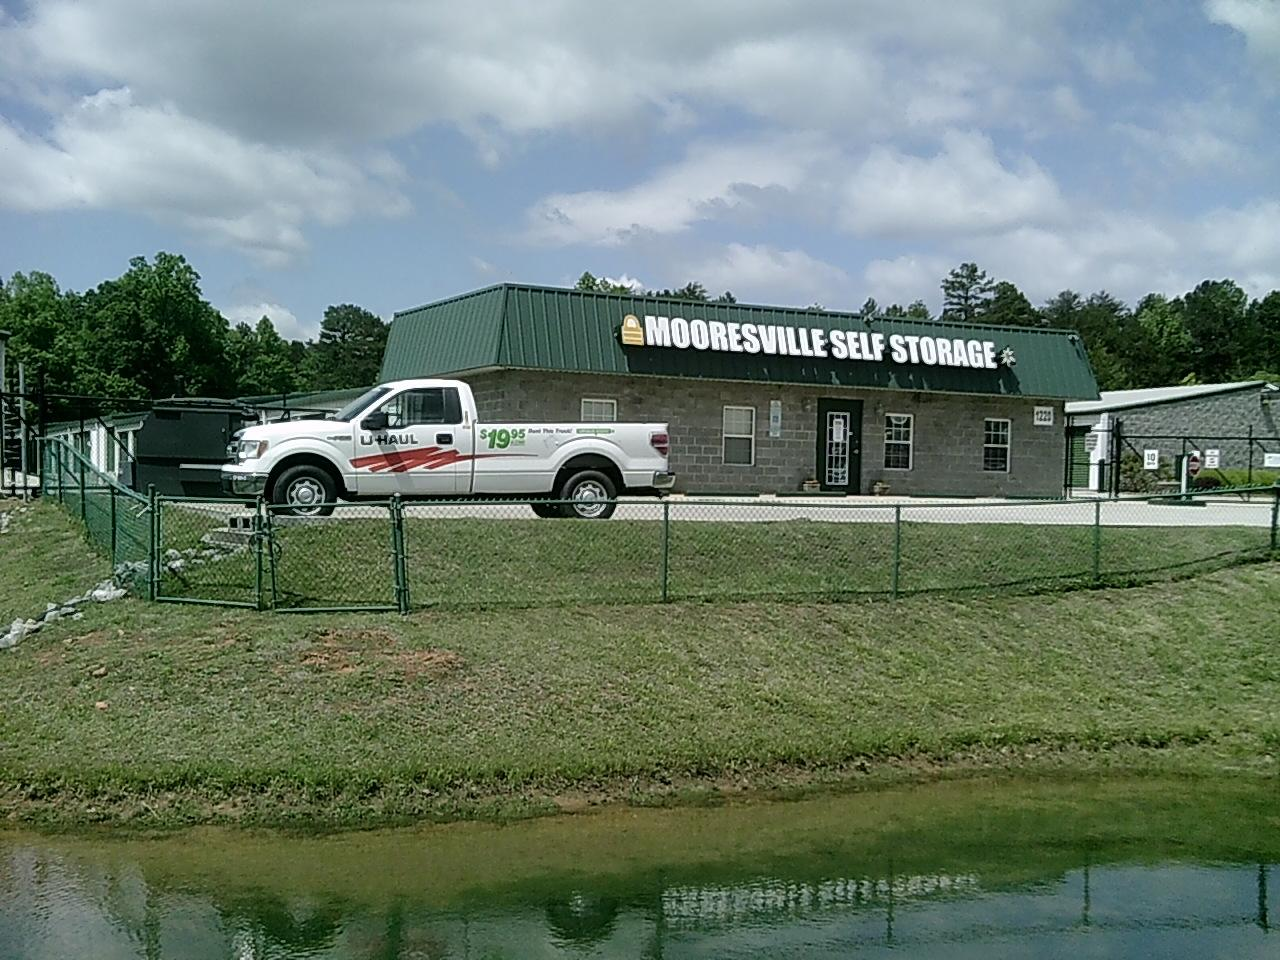 Mooresville Self Storage image 1